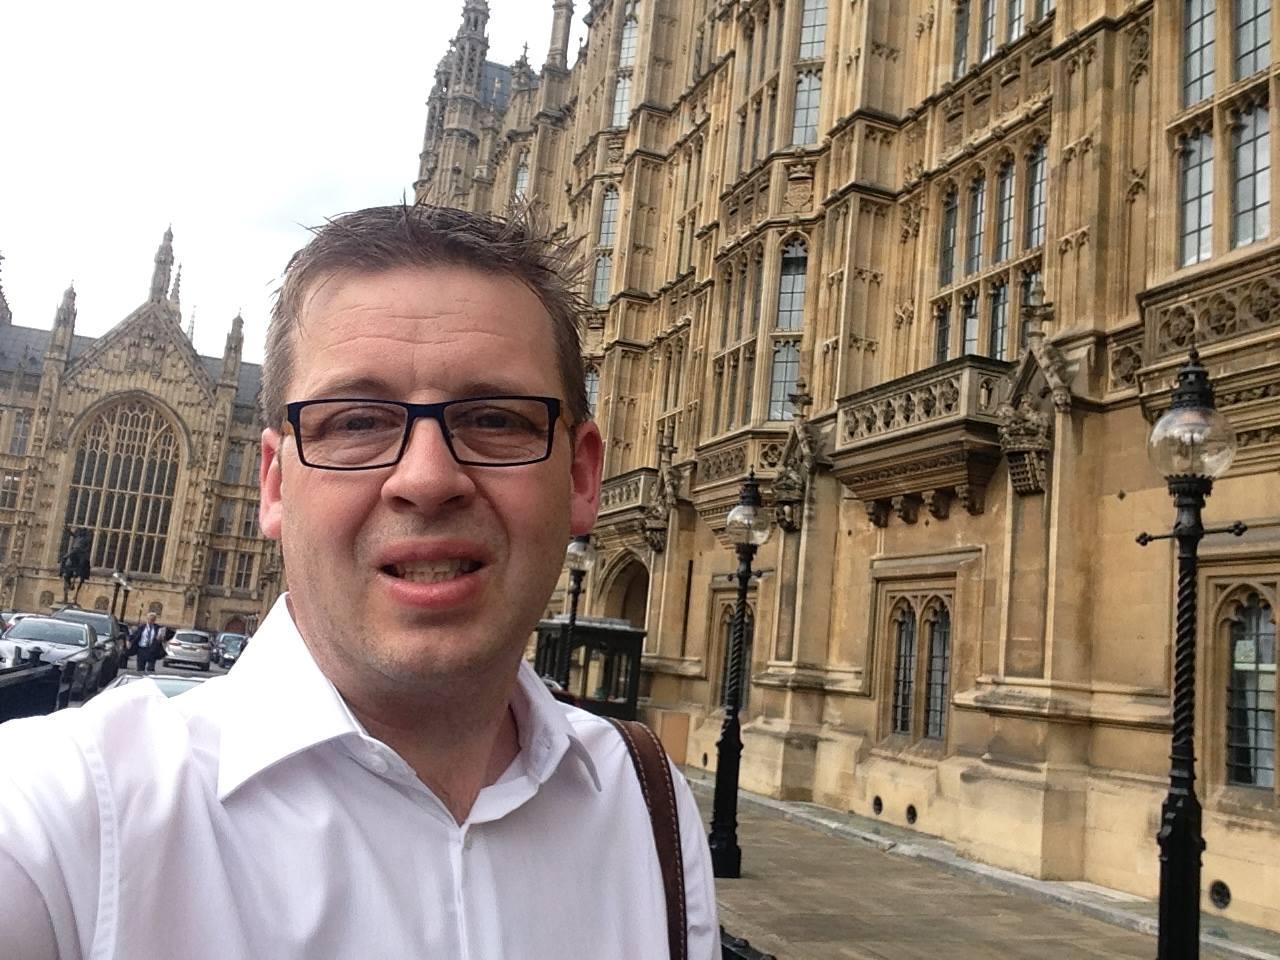 Tantrwm-Chainey-Visit-To-Parliament